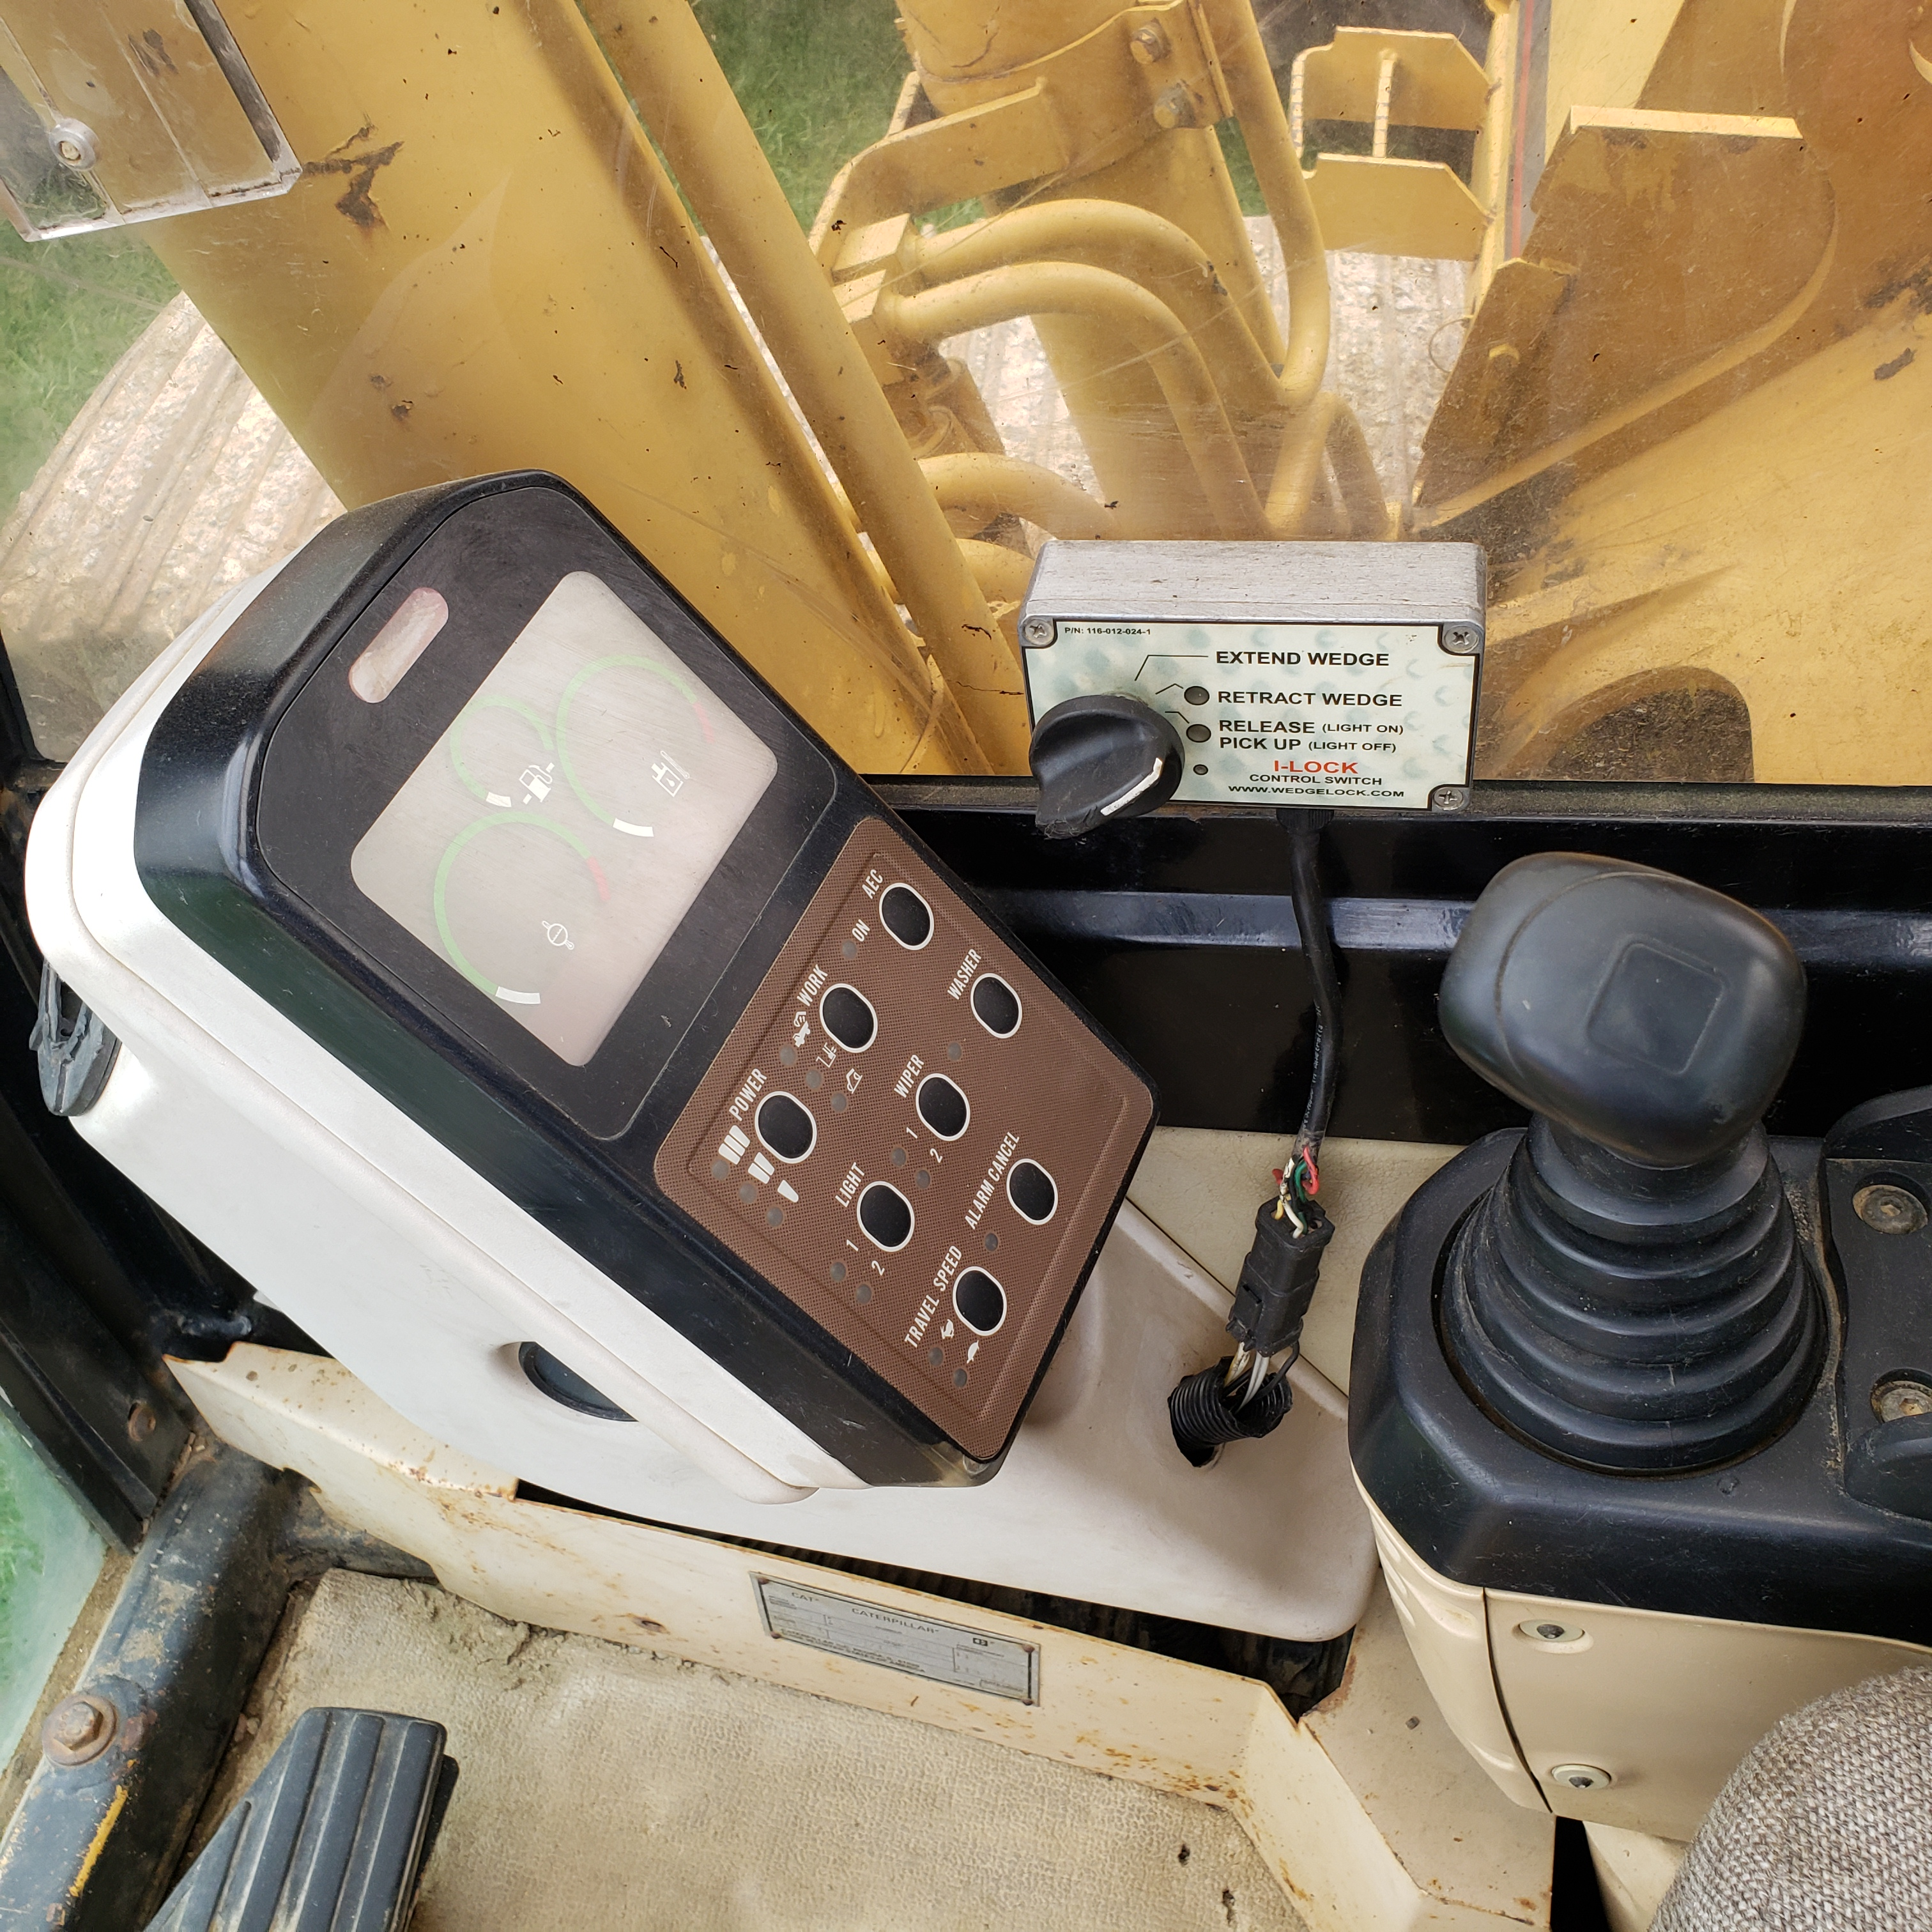 1996 Caterpillar 322L Hydraulic Excavator, Enclosed Cab, 28 in Bucket, Cat 3116 Engine, 9579 Hours - Image 13 of 18